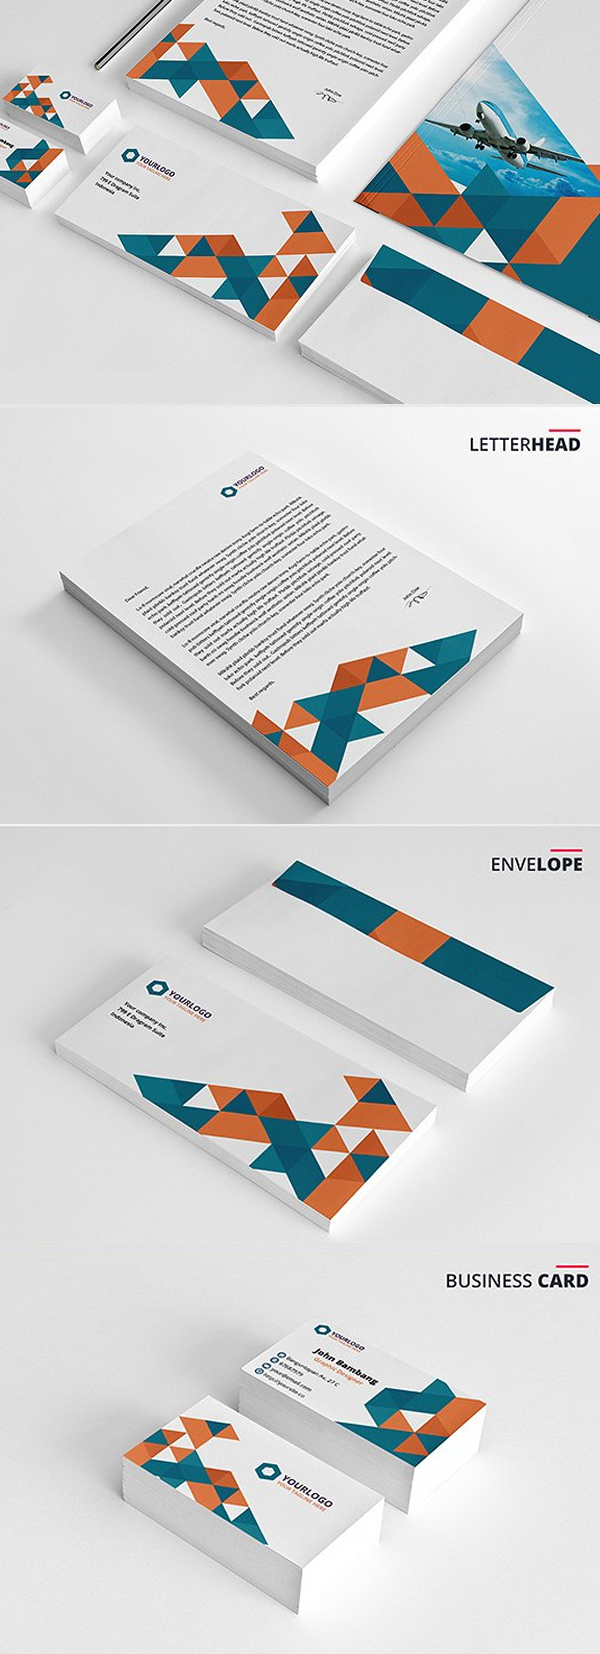 Modern Business Branding / Stationery Templates Design - 14